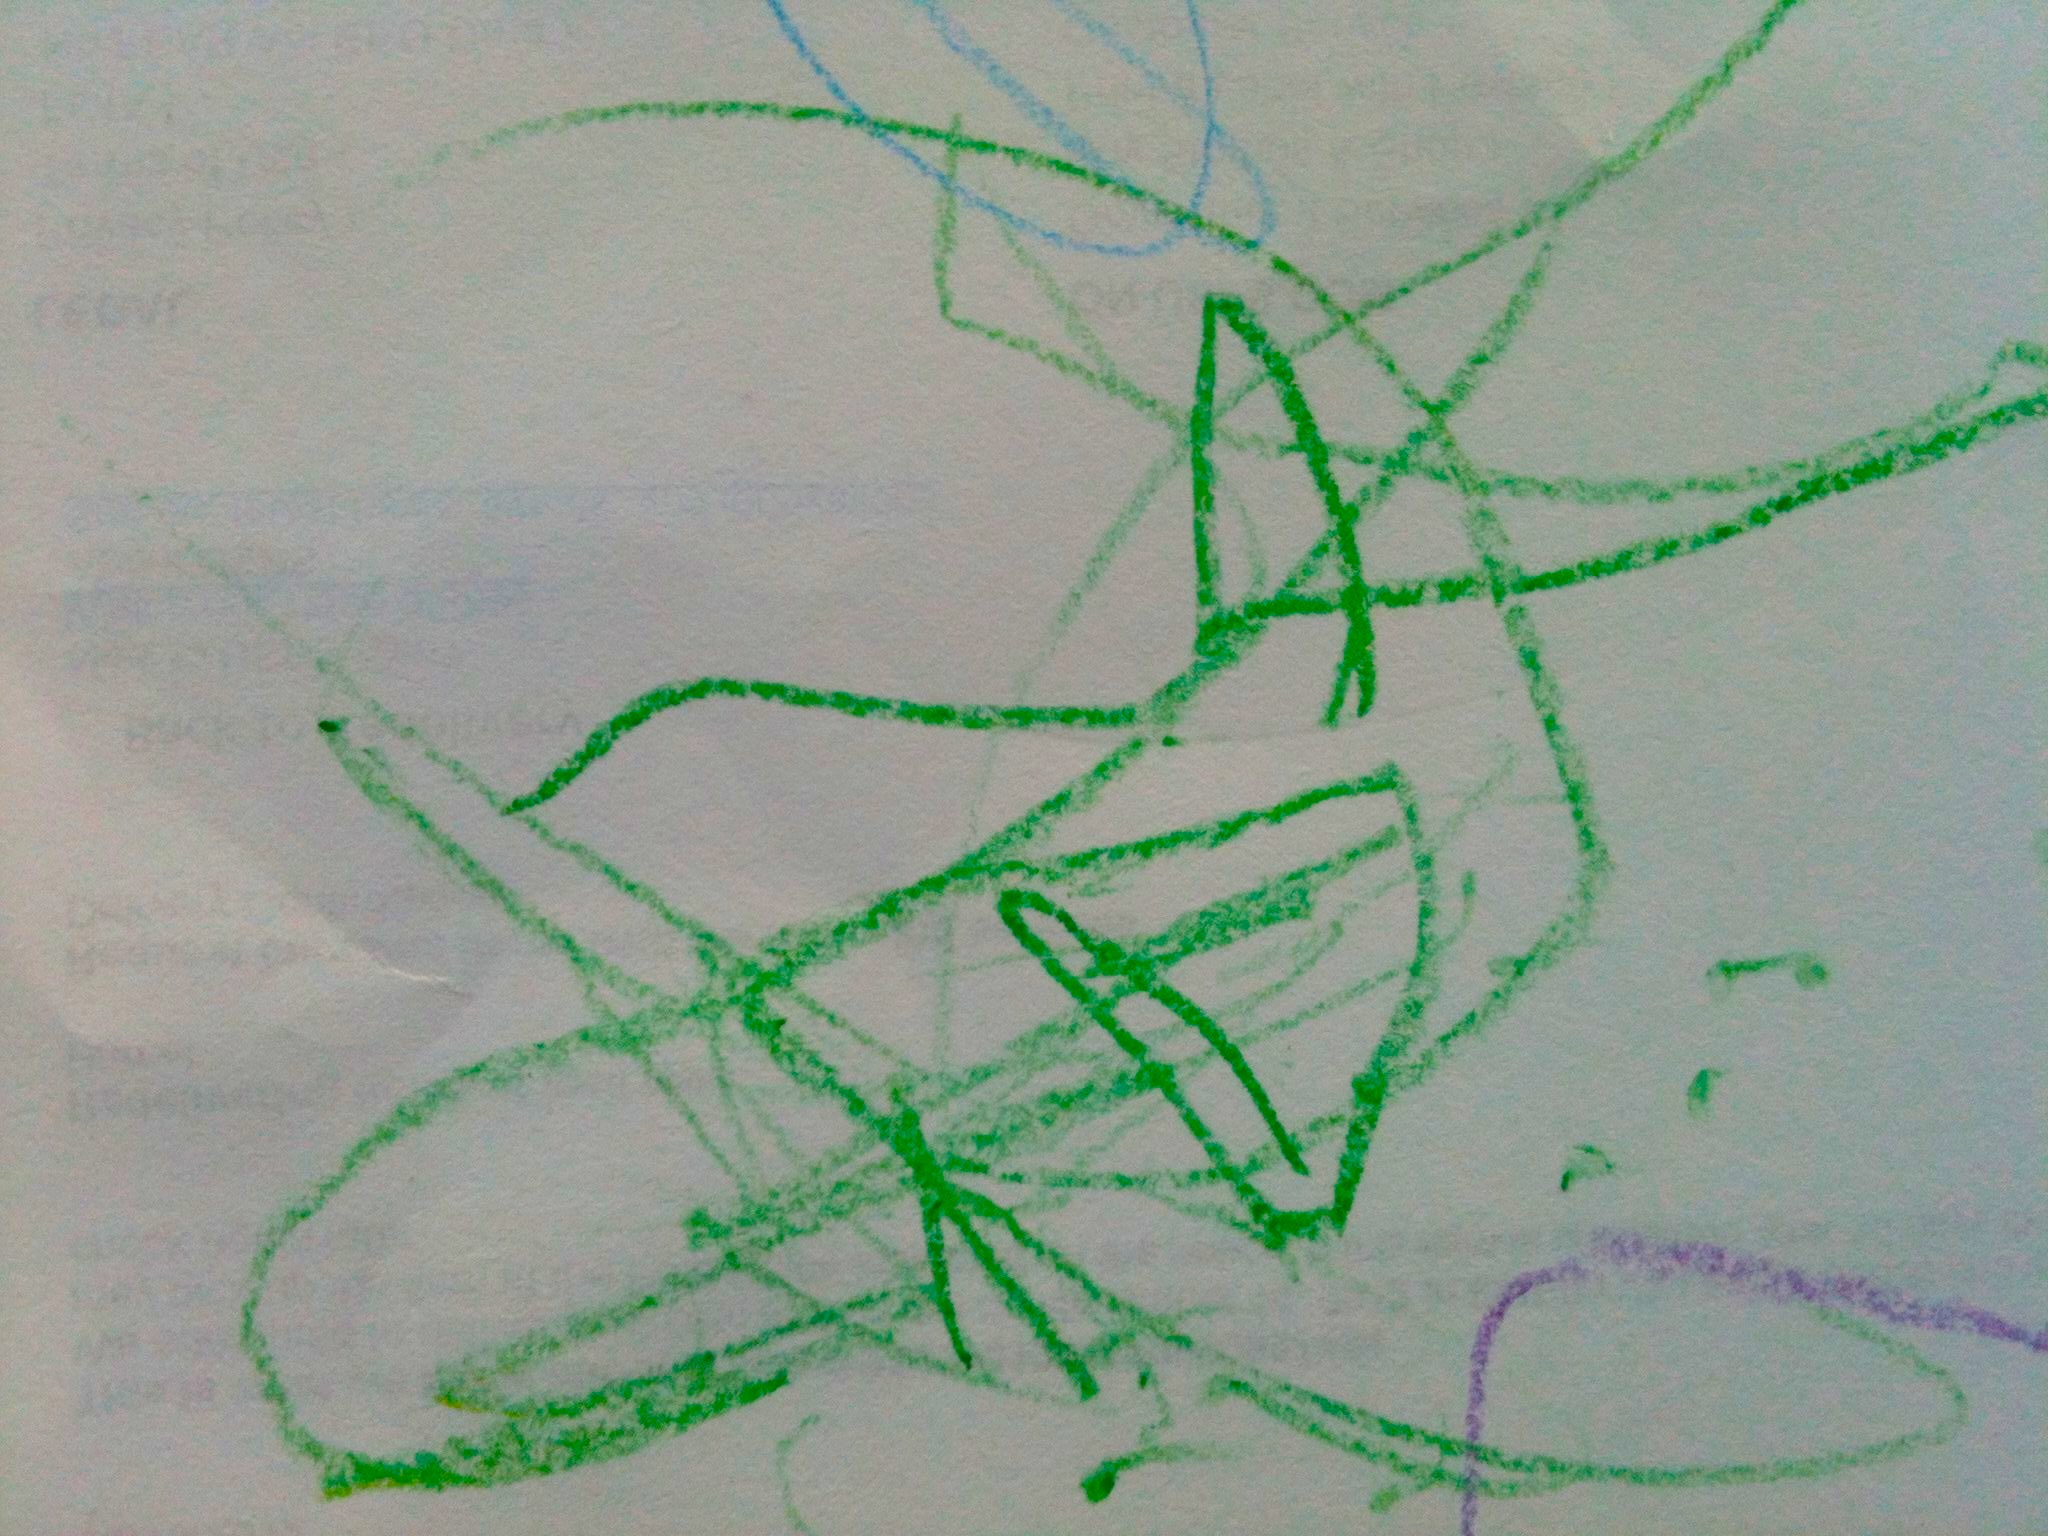 Inika Moni RayMukerji. Plane. 2013. Crayons on Paper